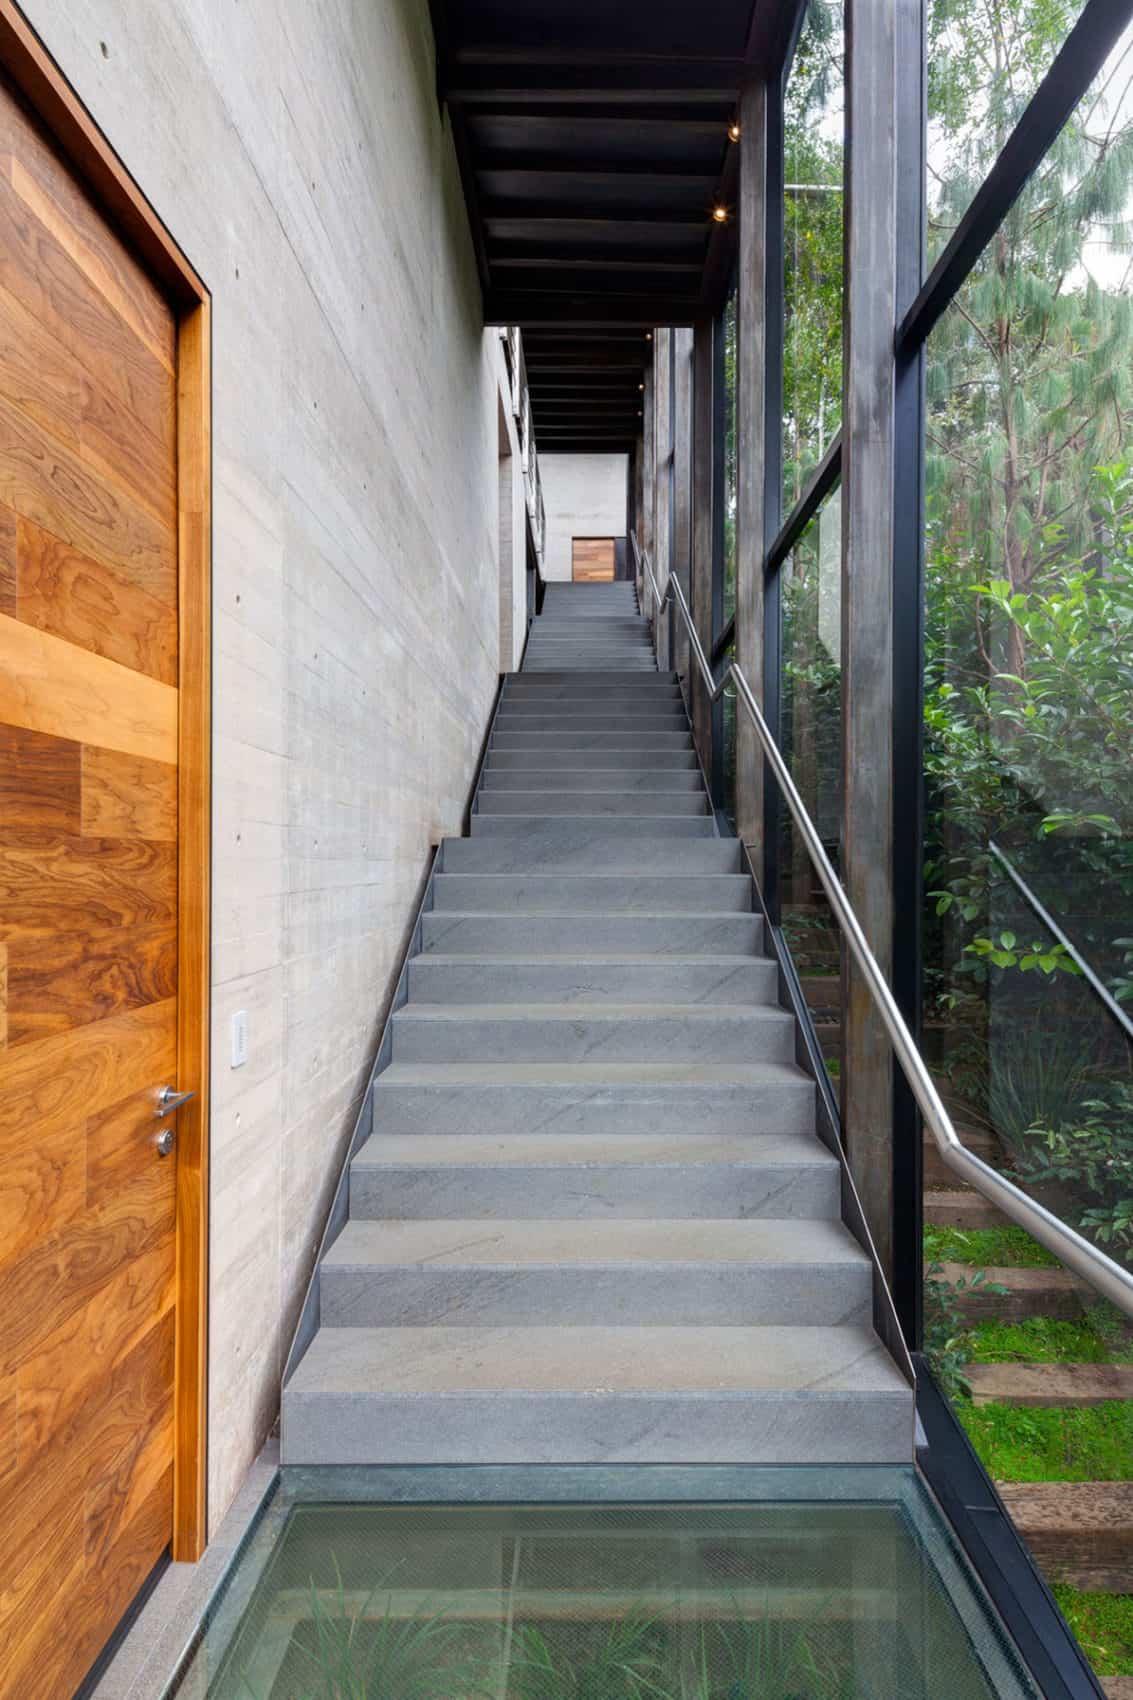 Tepozcuautla House by grupoarquitectura (21)